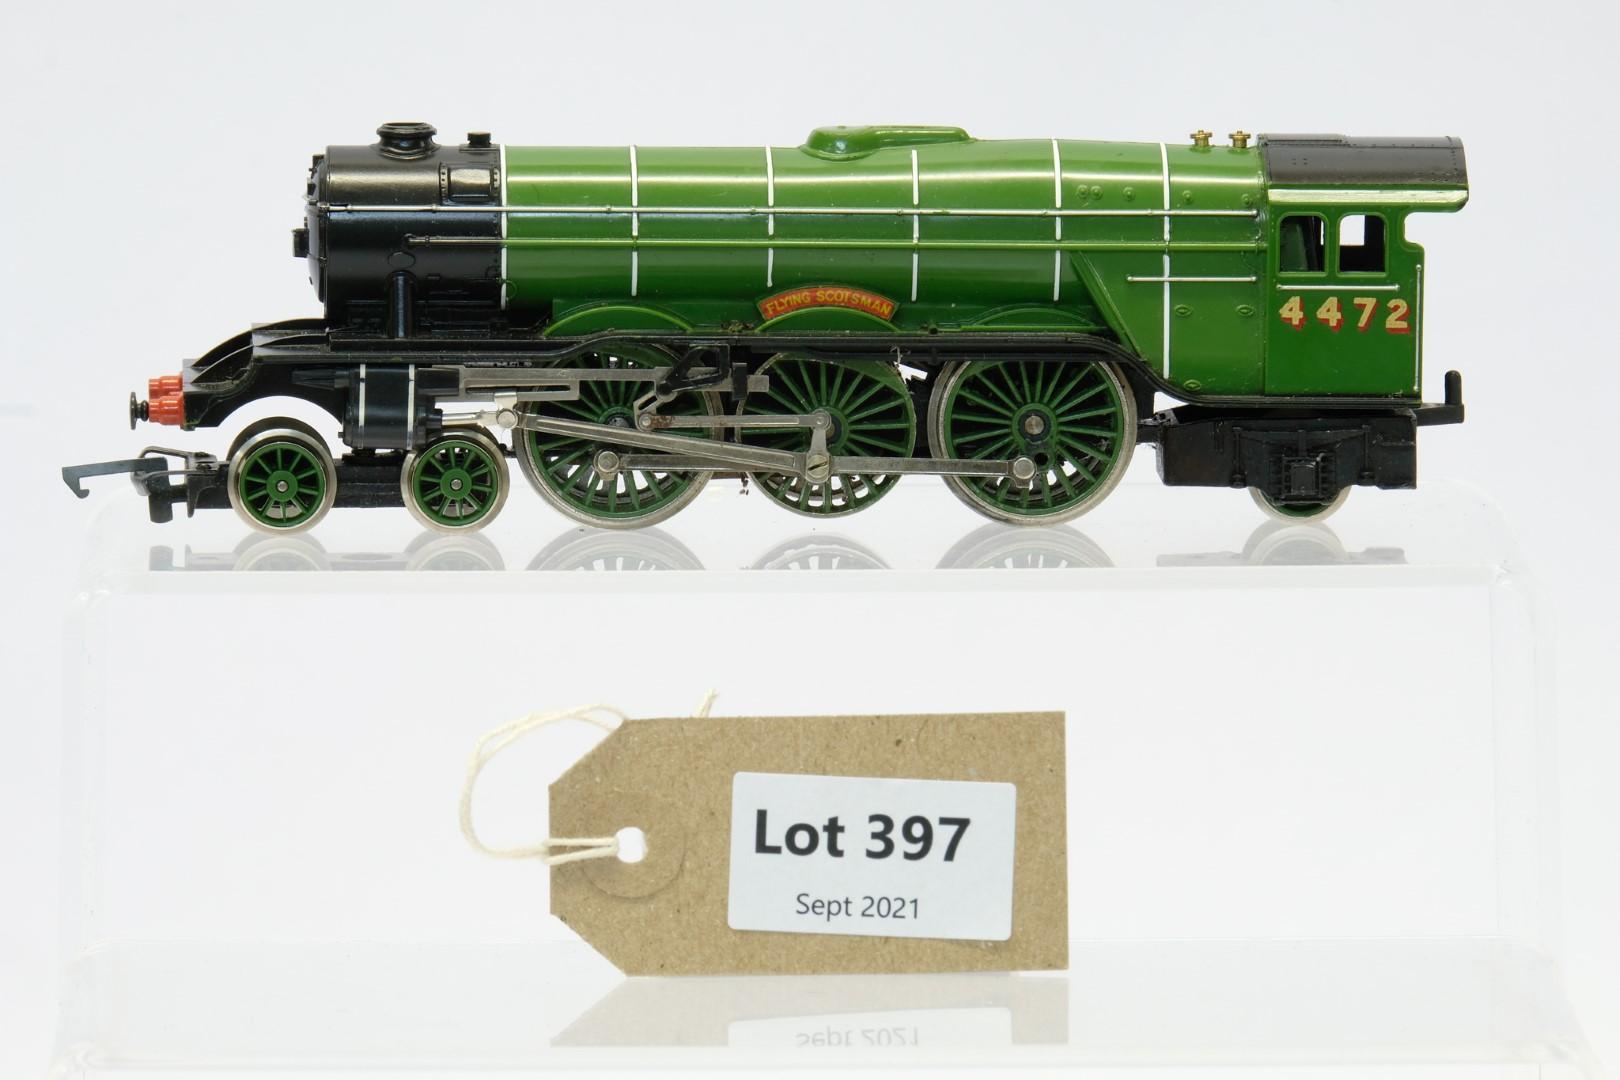 Hornby A1 Class 4-6-2 Steam Locomotive Lner 4472 Flying Scotsman - No Box | No Tender